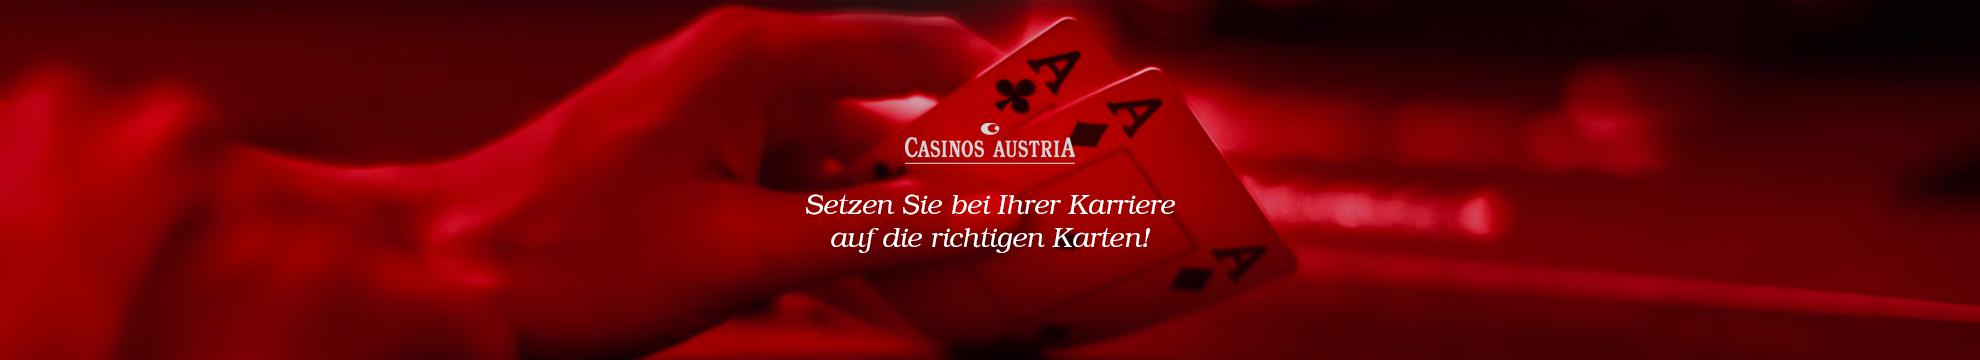 Kreta Casino Austria 575995